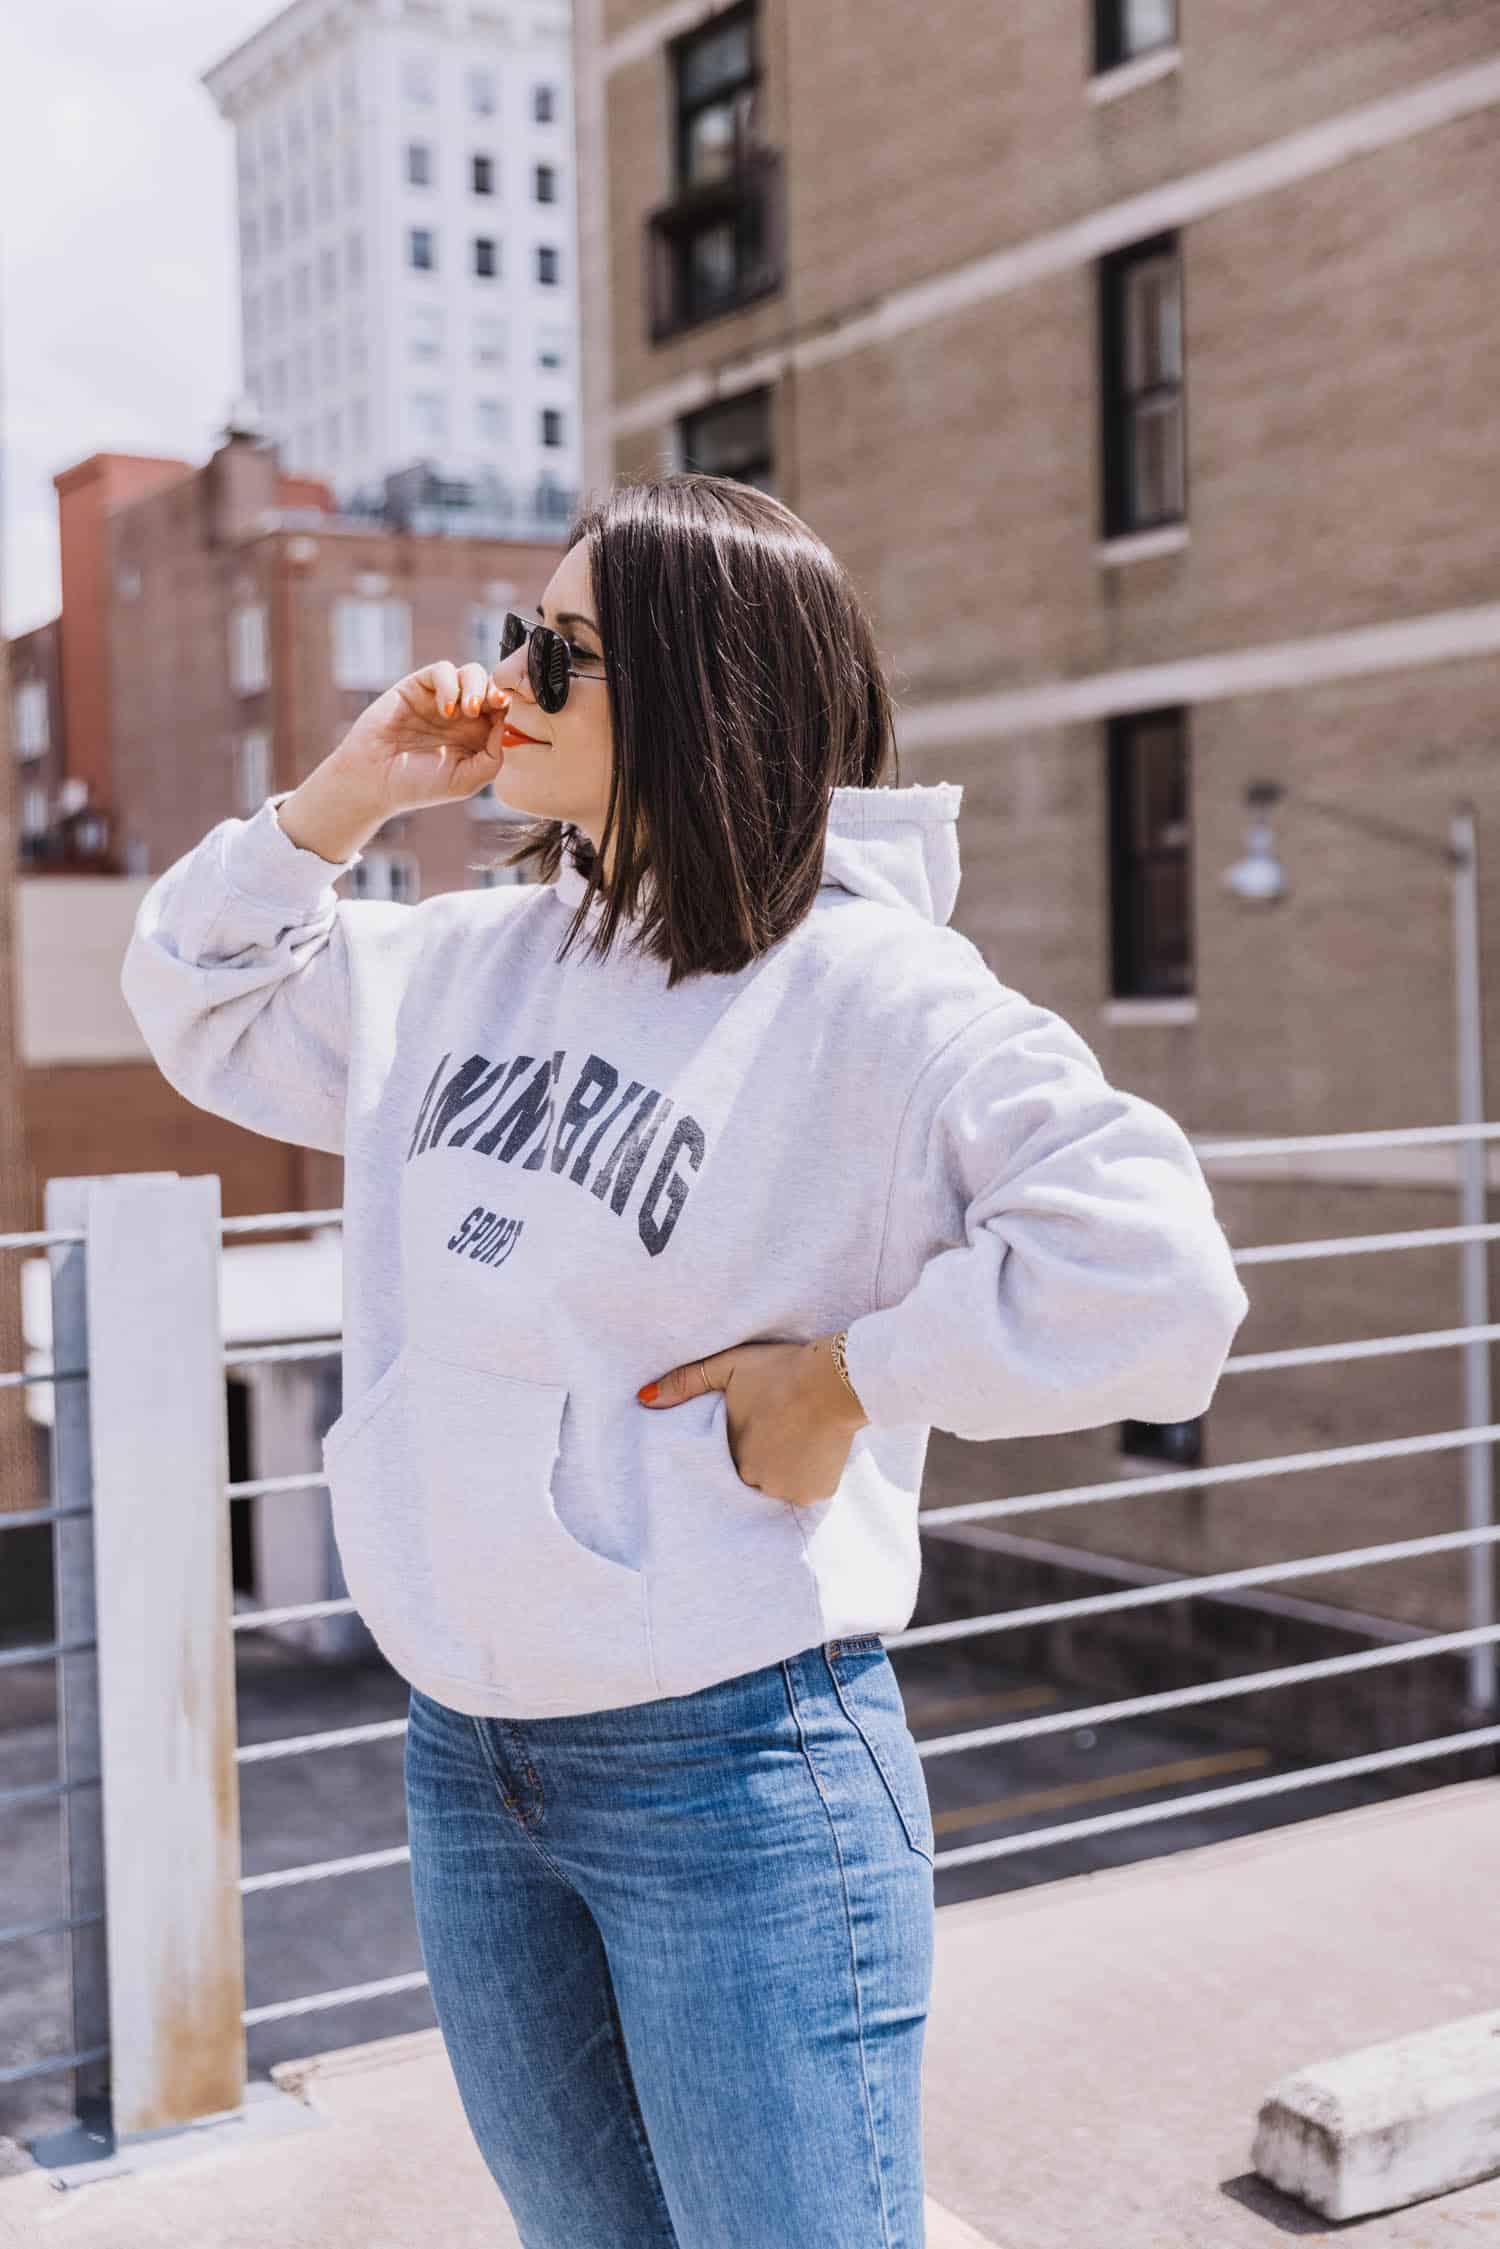 Anine Bing Sweatshirts To Shop